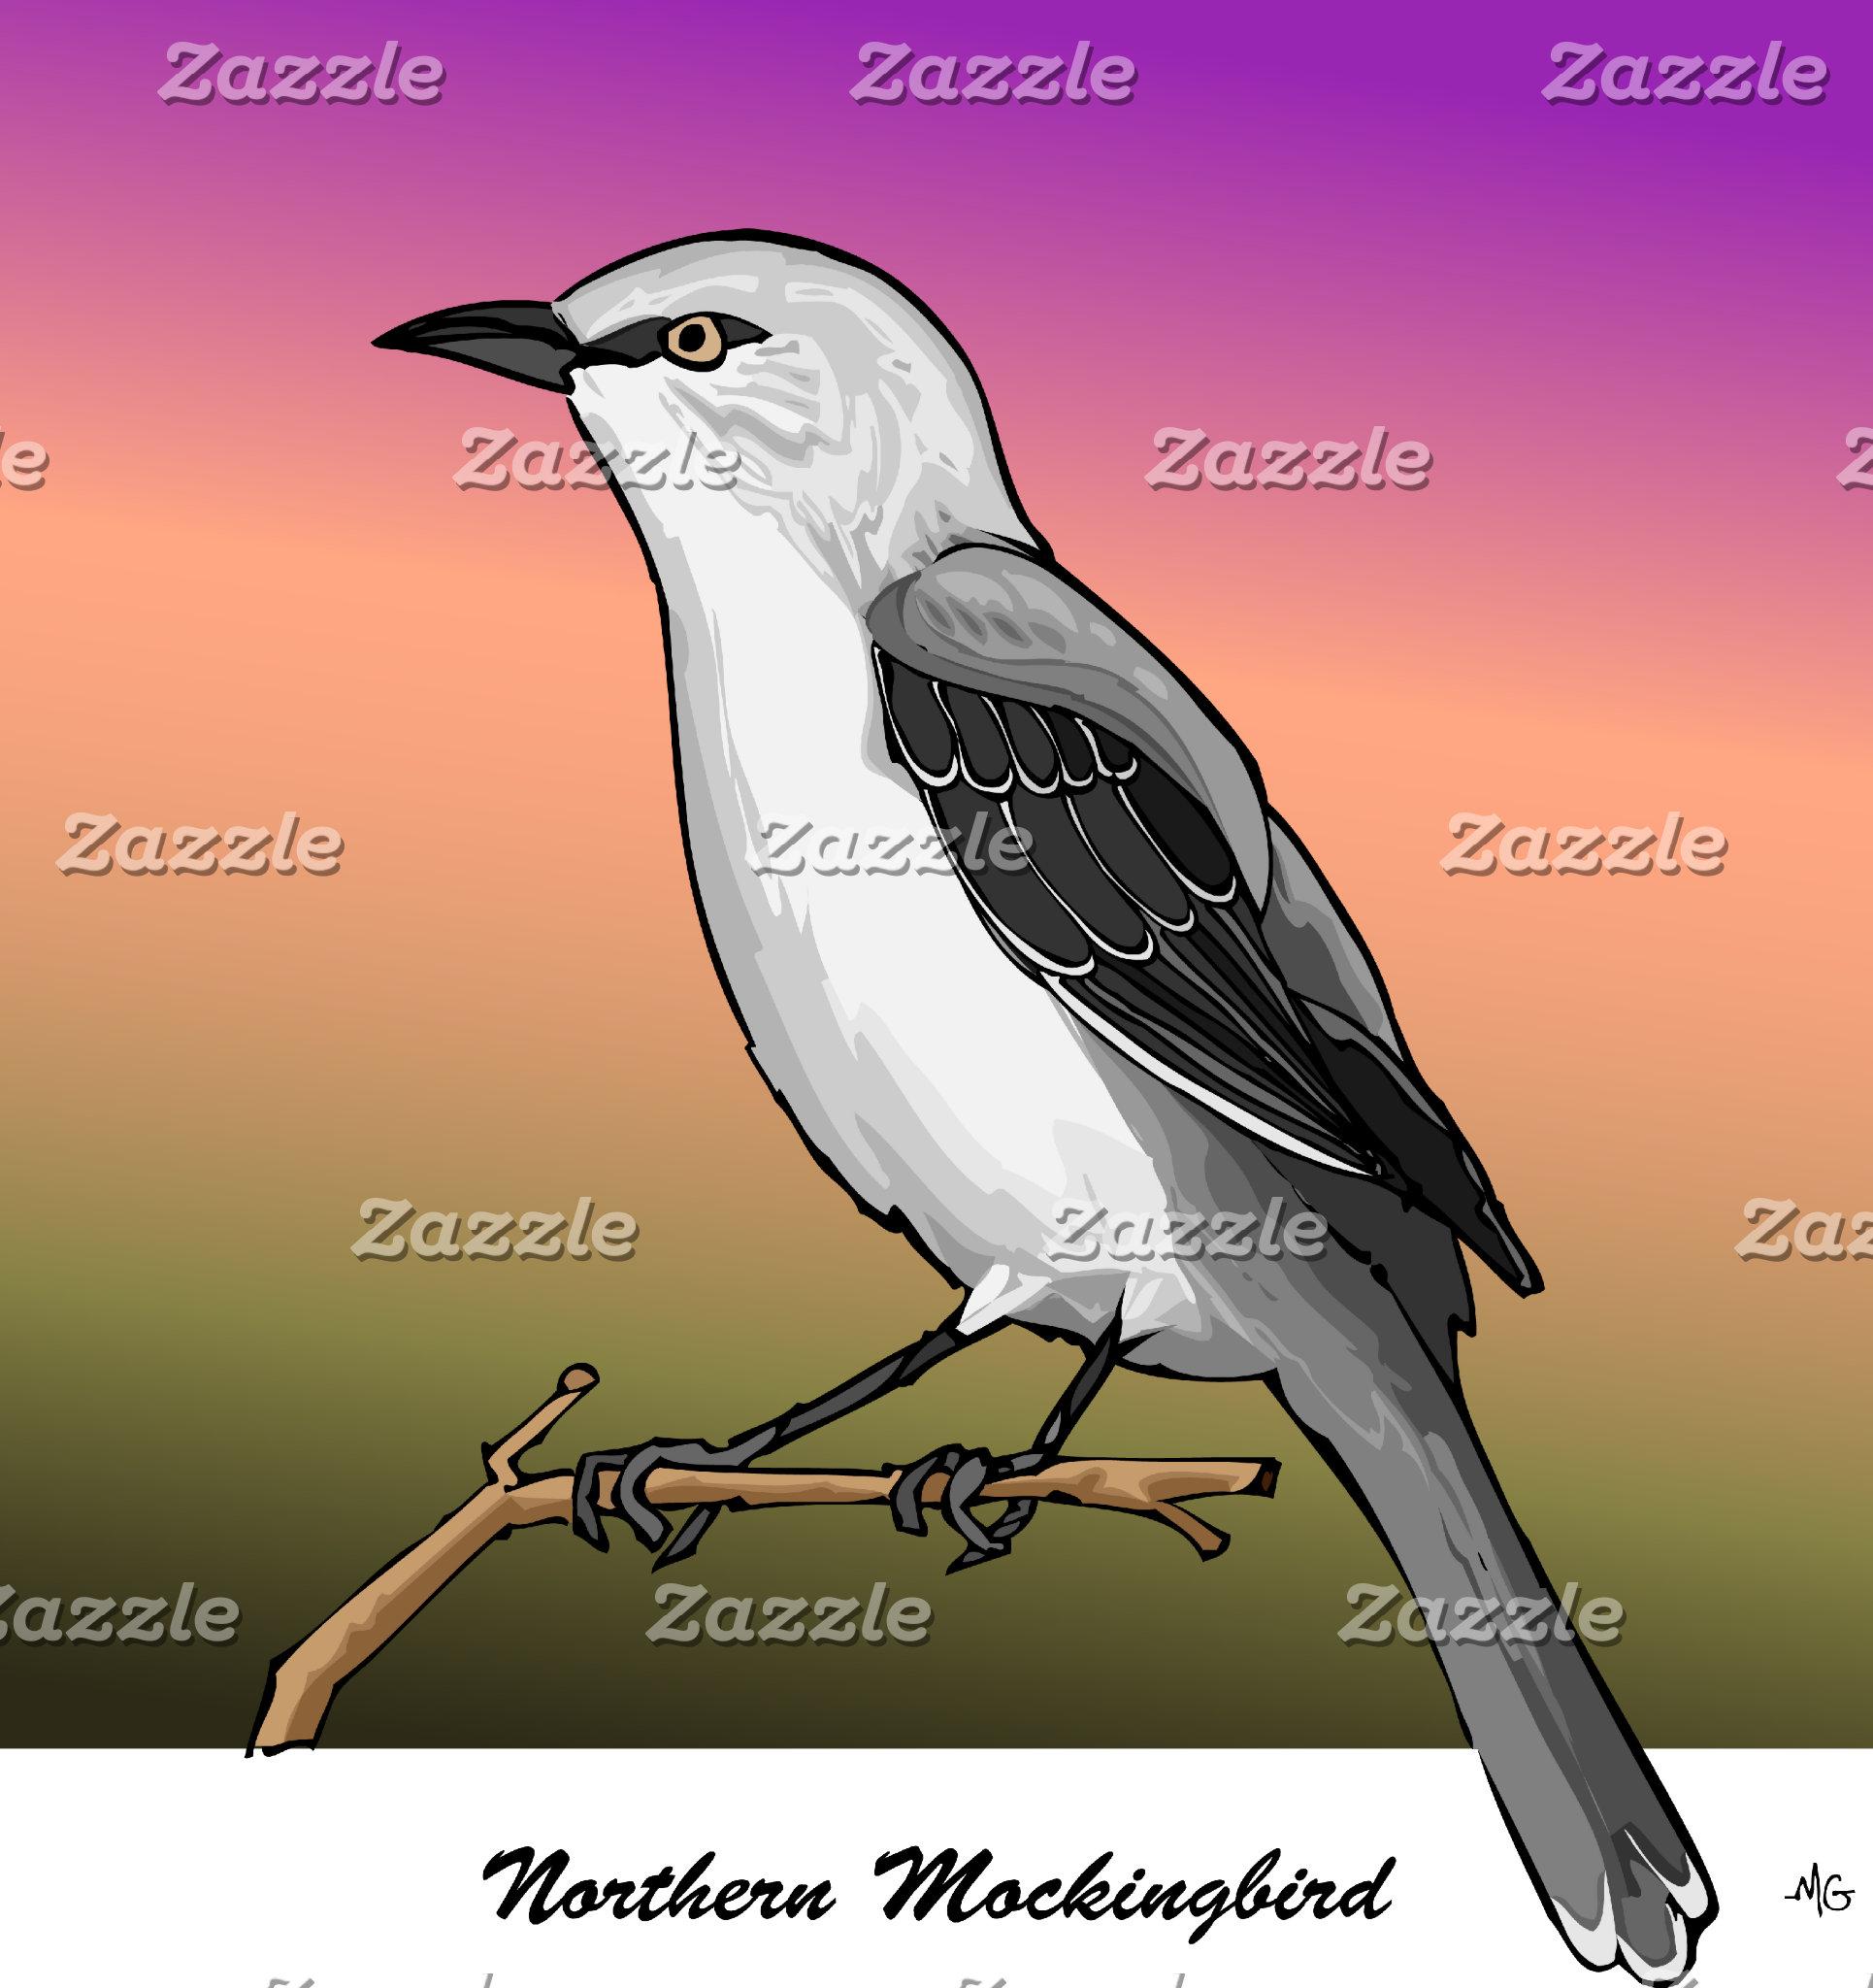 NORTHERN MOCKINGBIRD rev.2.0